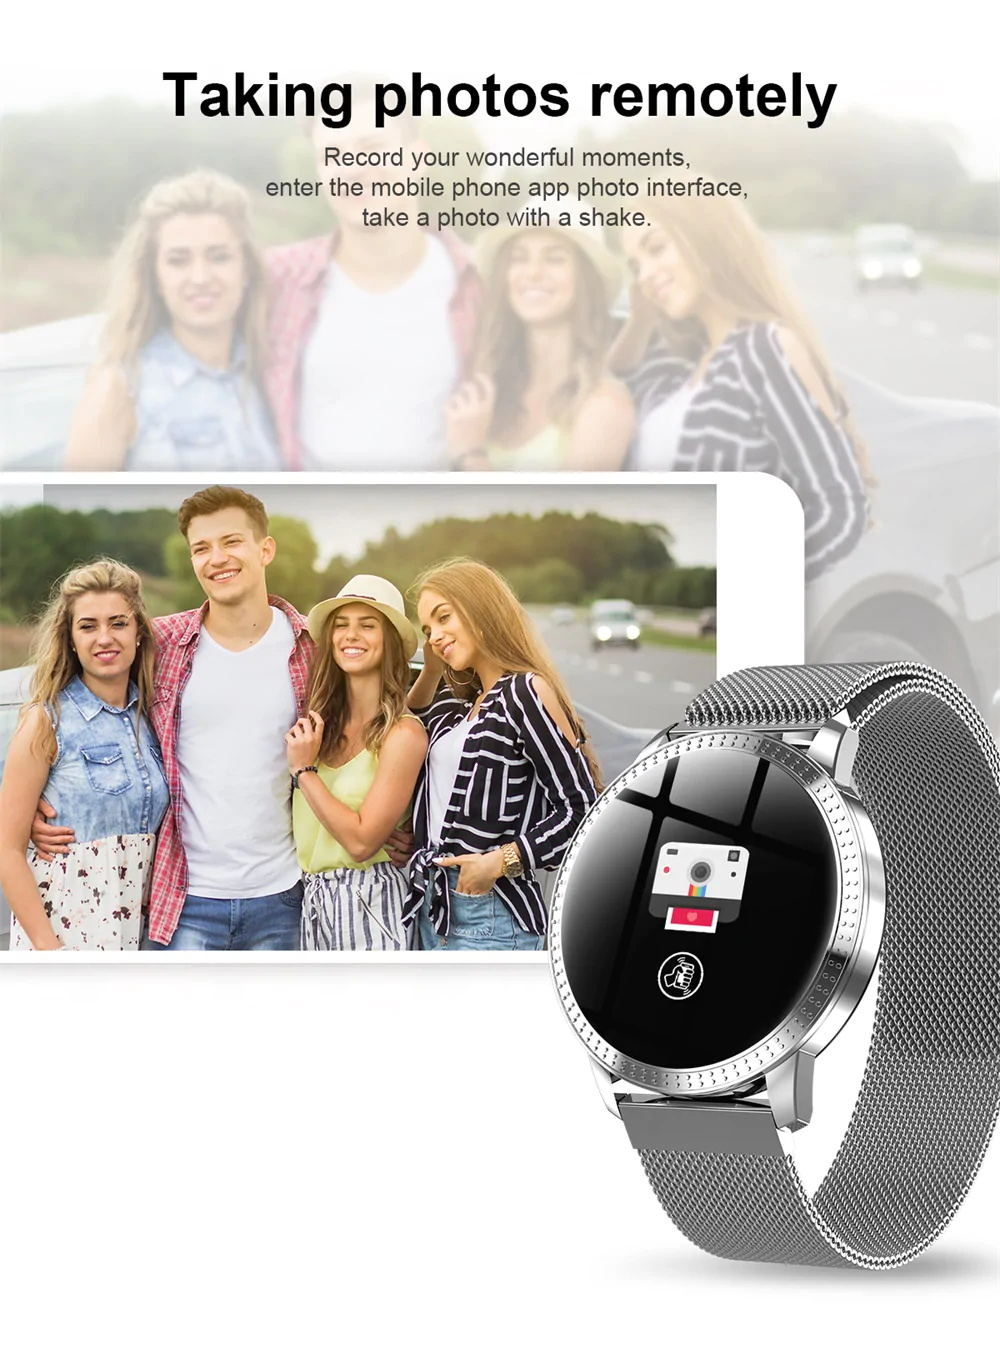 buy cf18 sports smartwatch